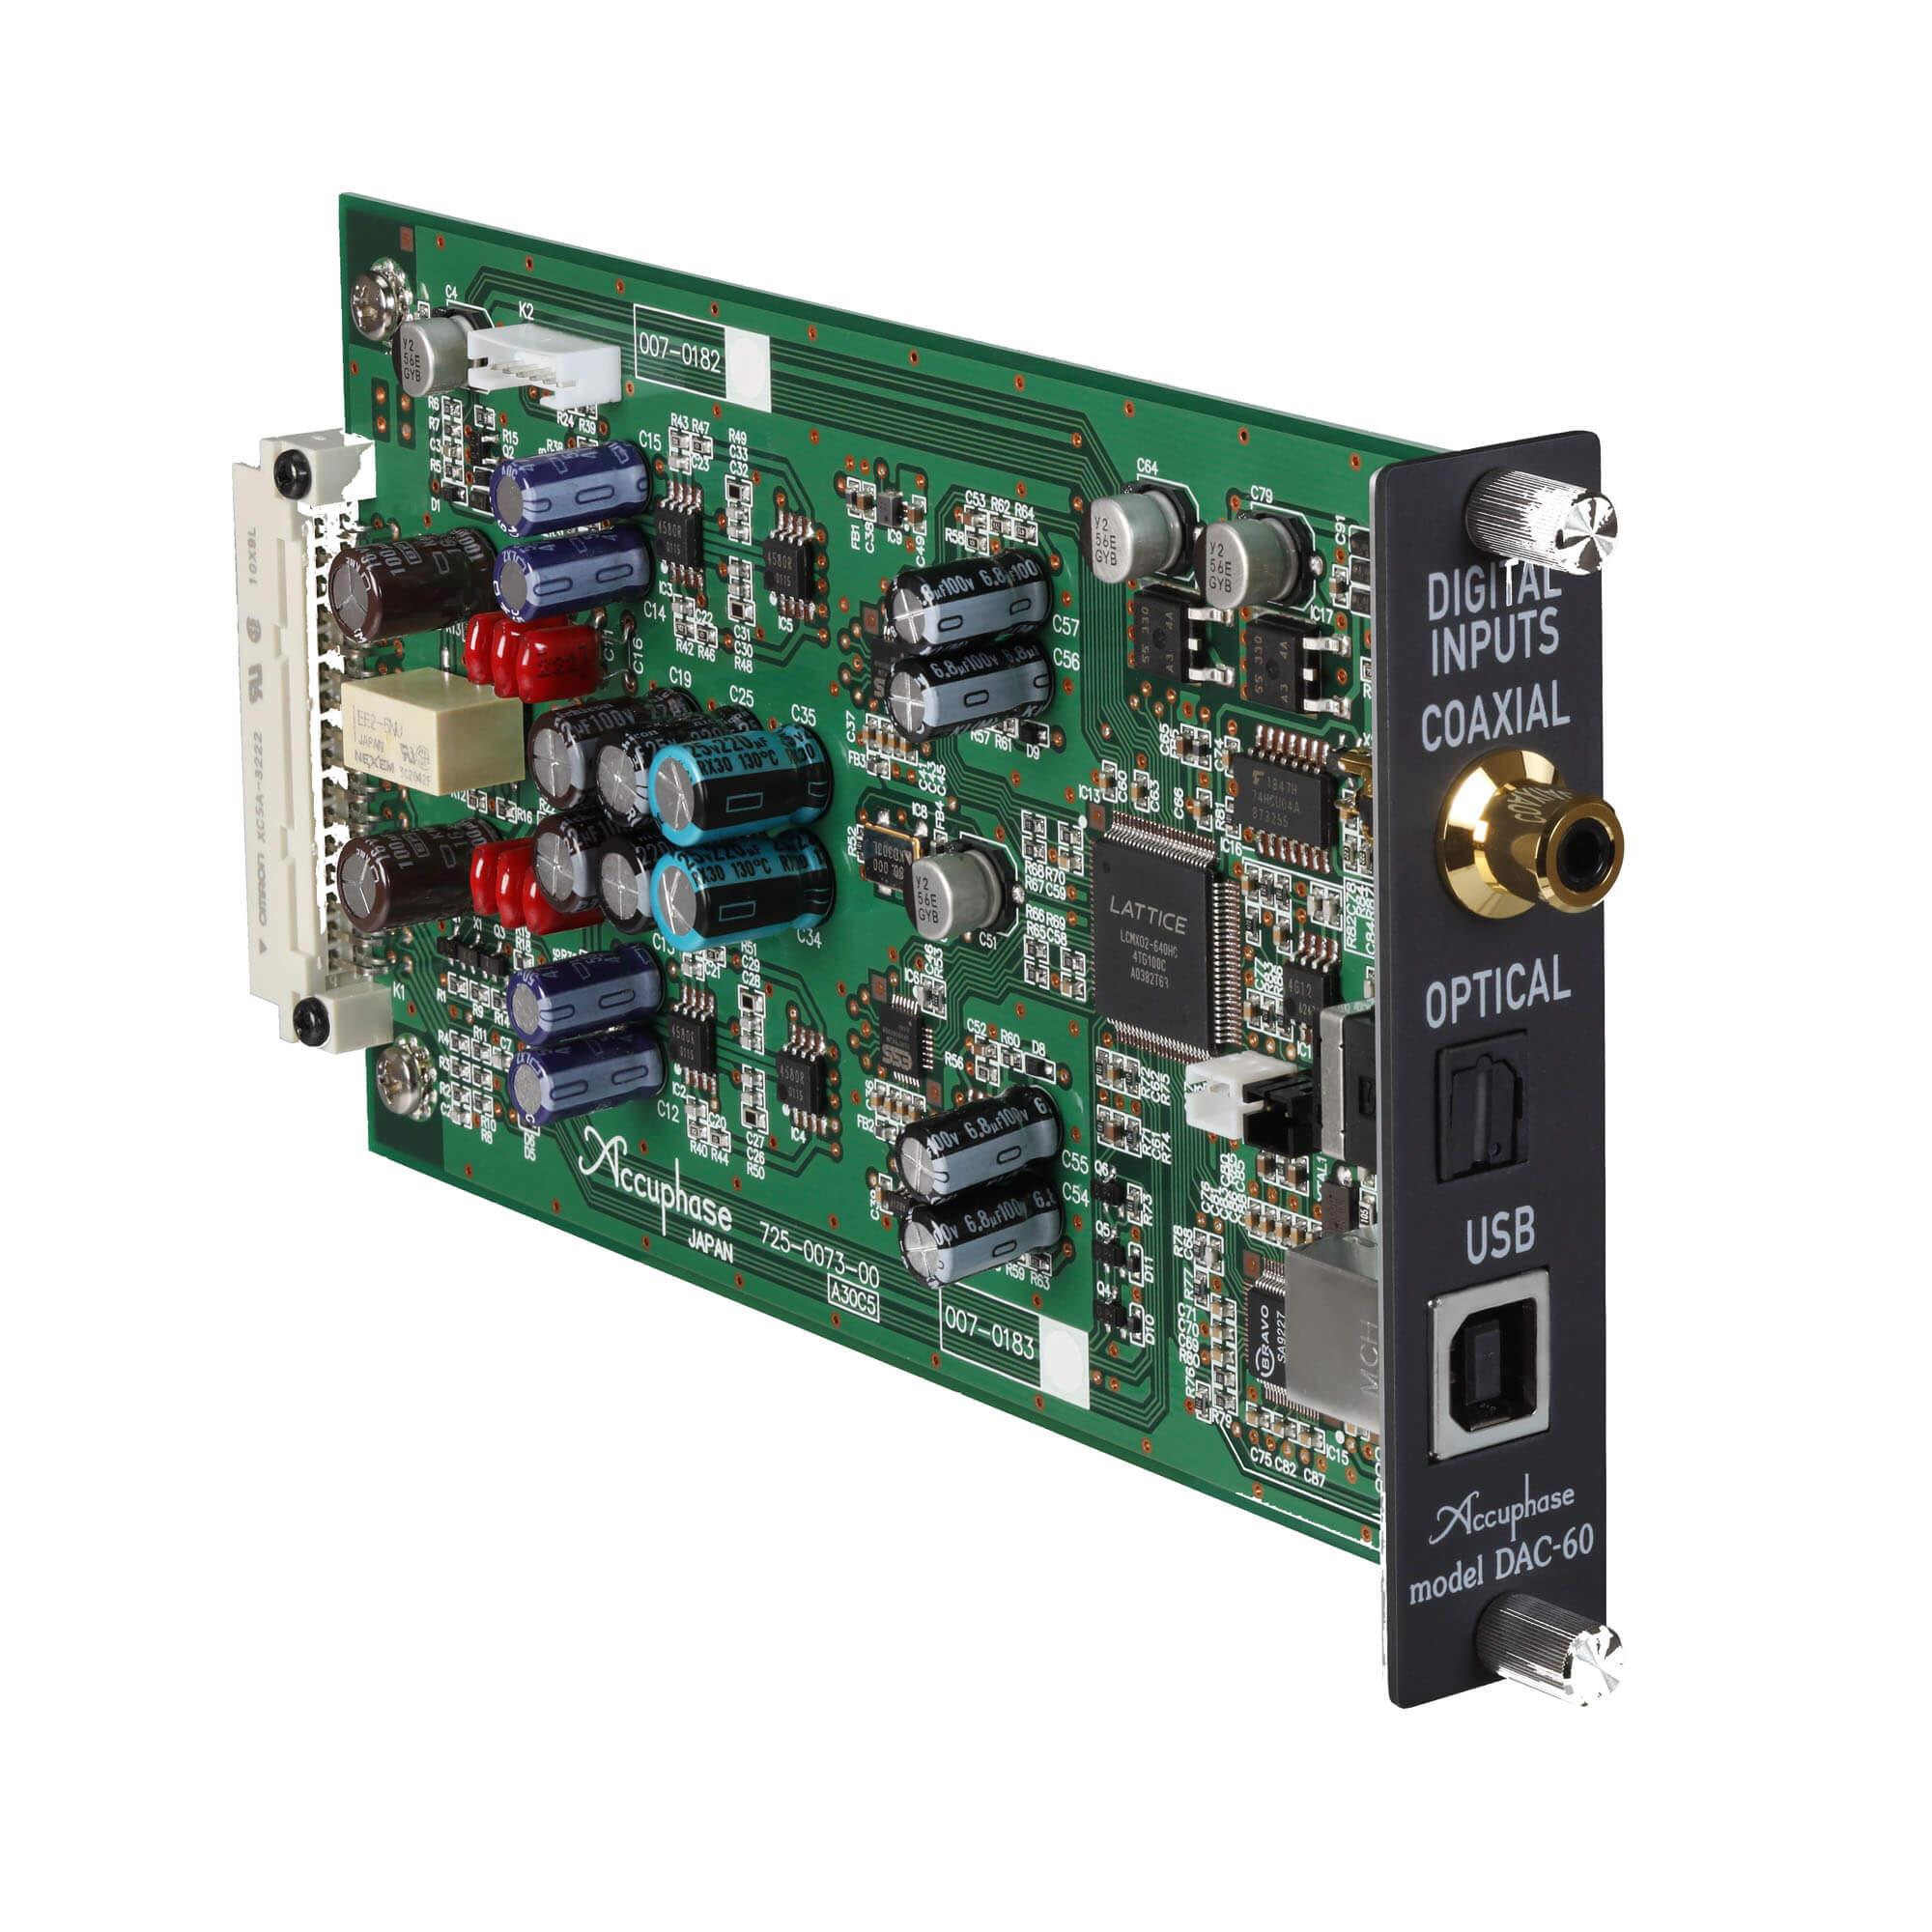 Accuphase DAC-60 DAC Board